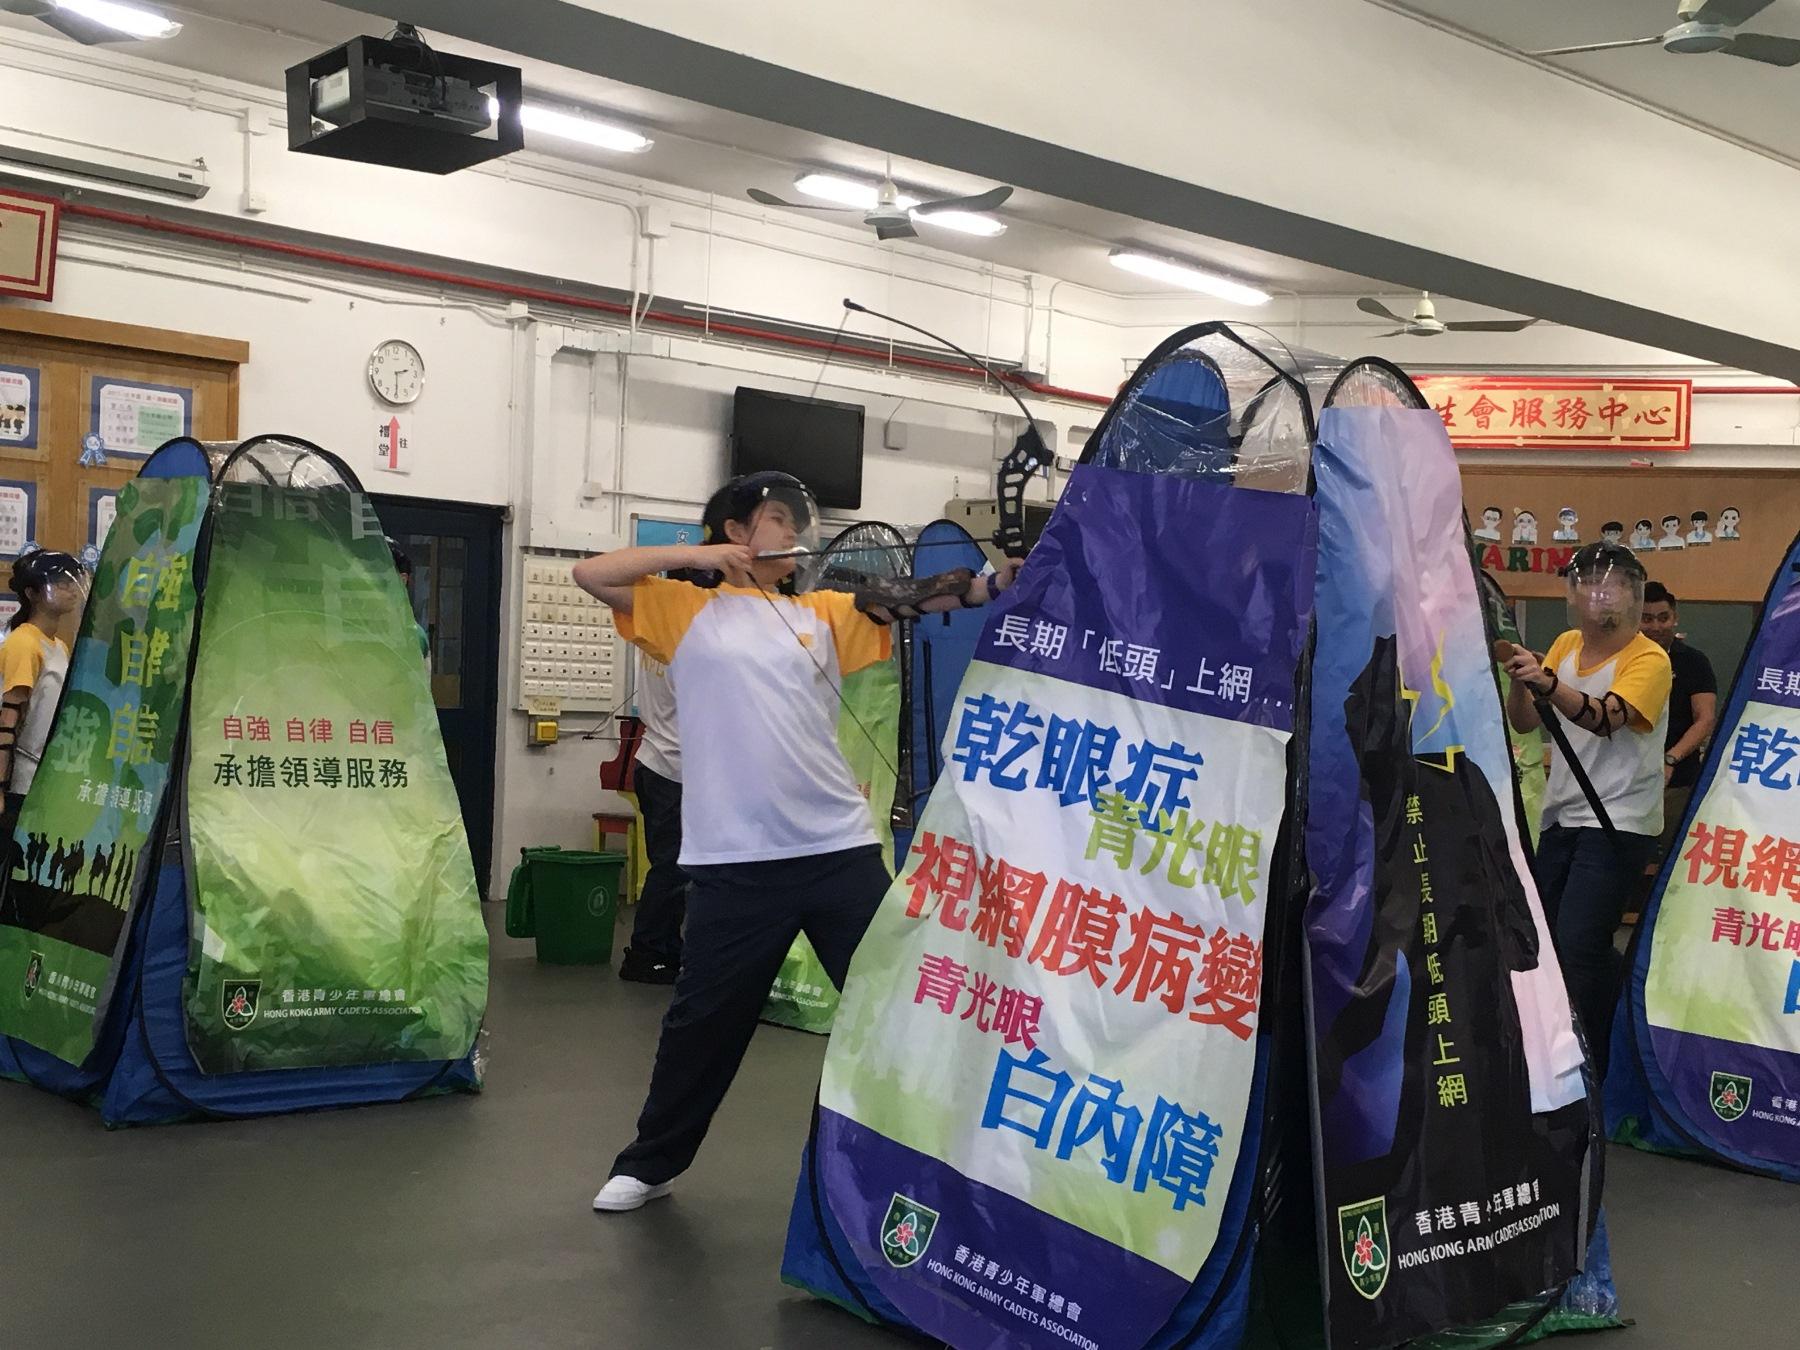 http://npc.edu.hk/sites/default/files/img_3684.jpg